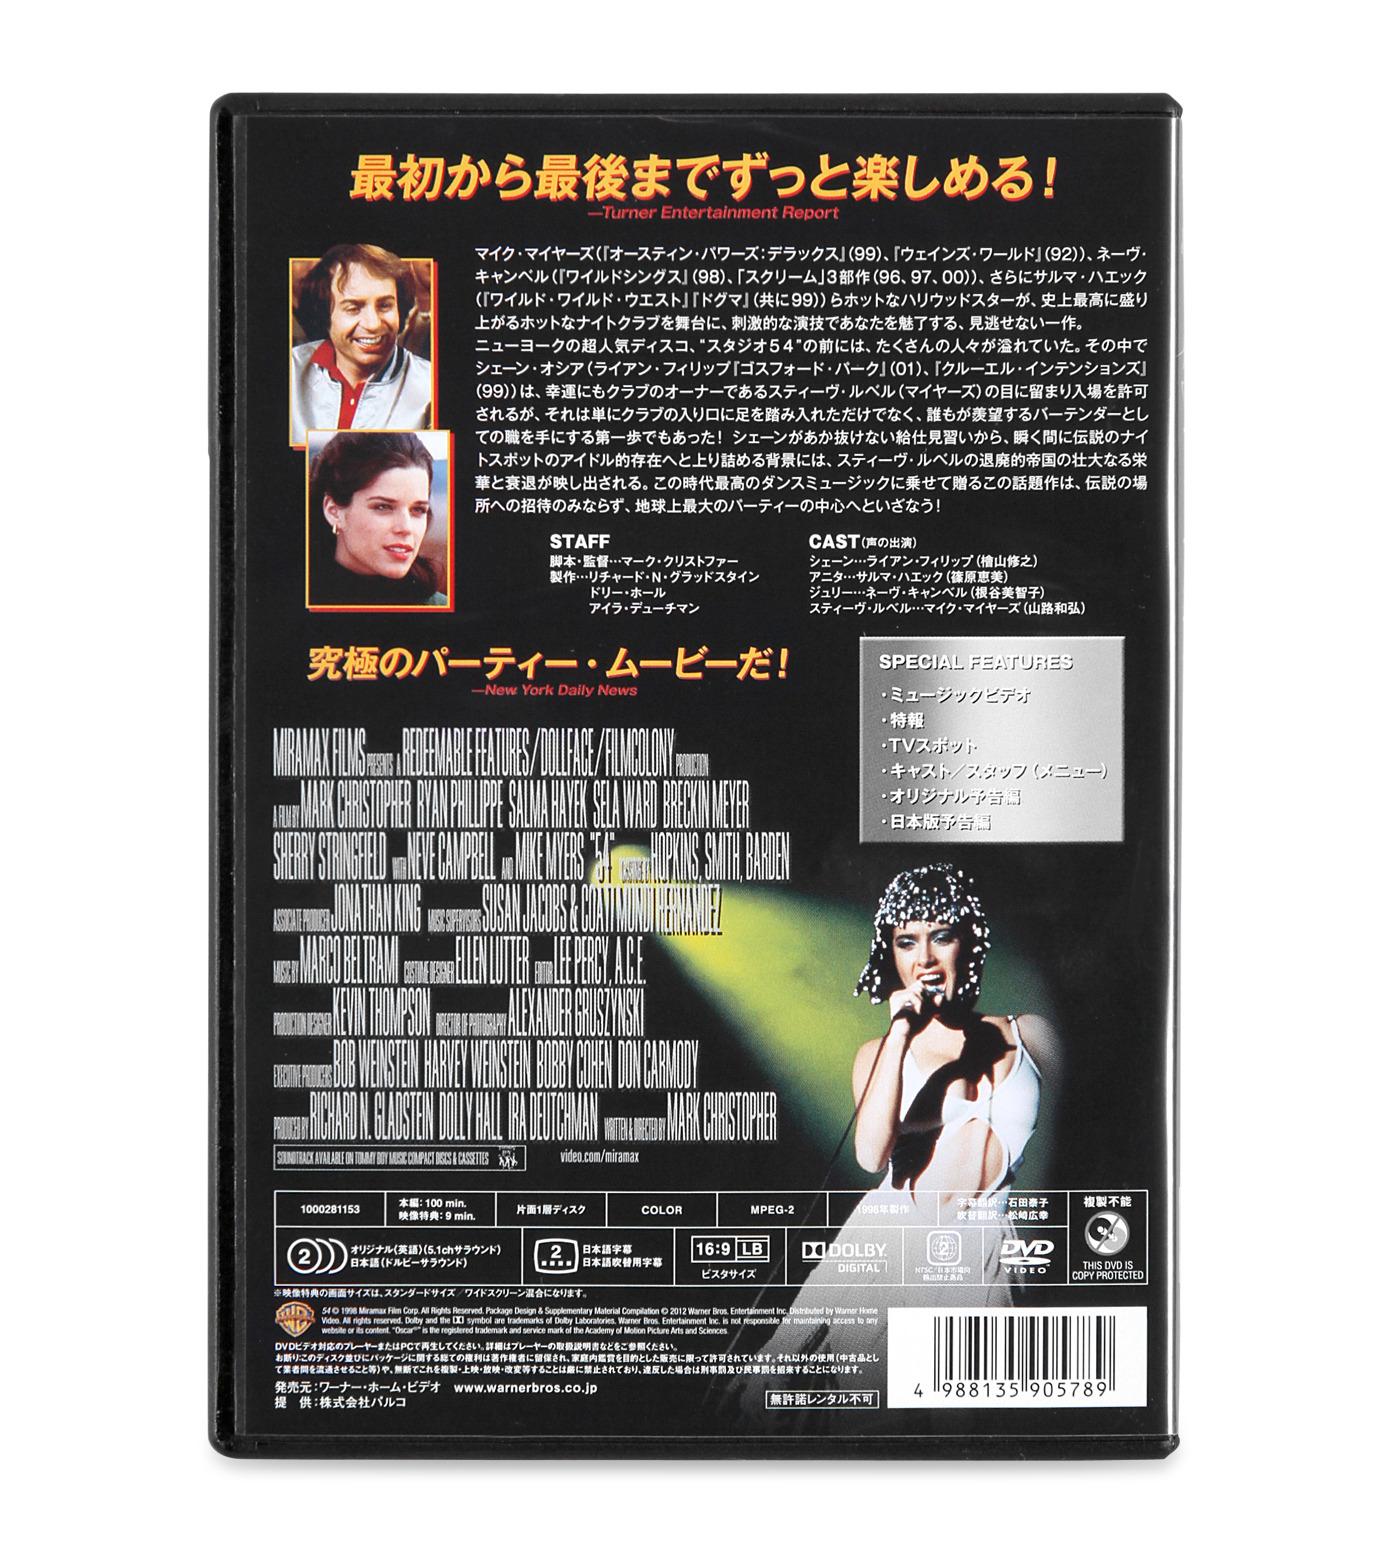 SURF DVD()のSTUDIO 54-NONE-54-0 拡大詳細画像2